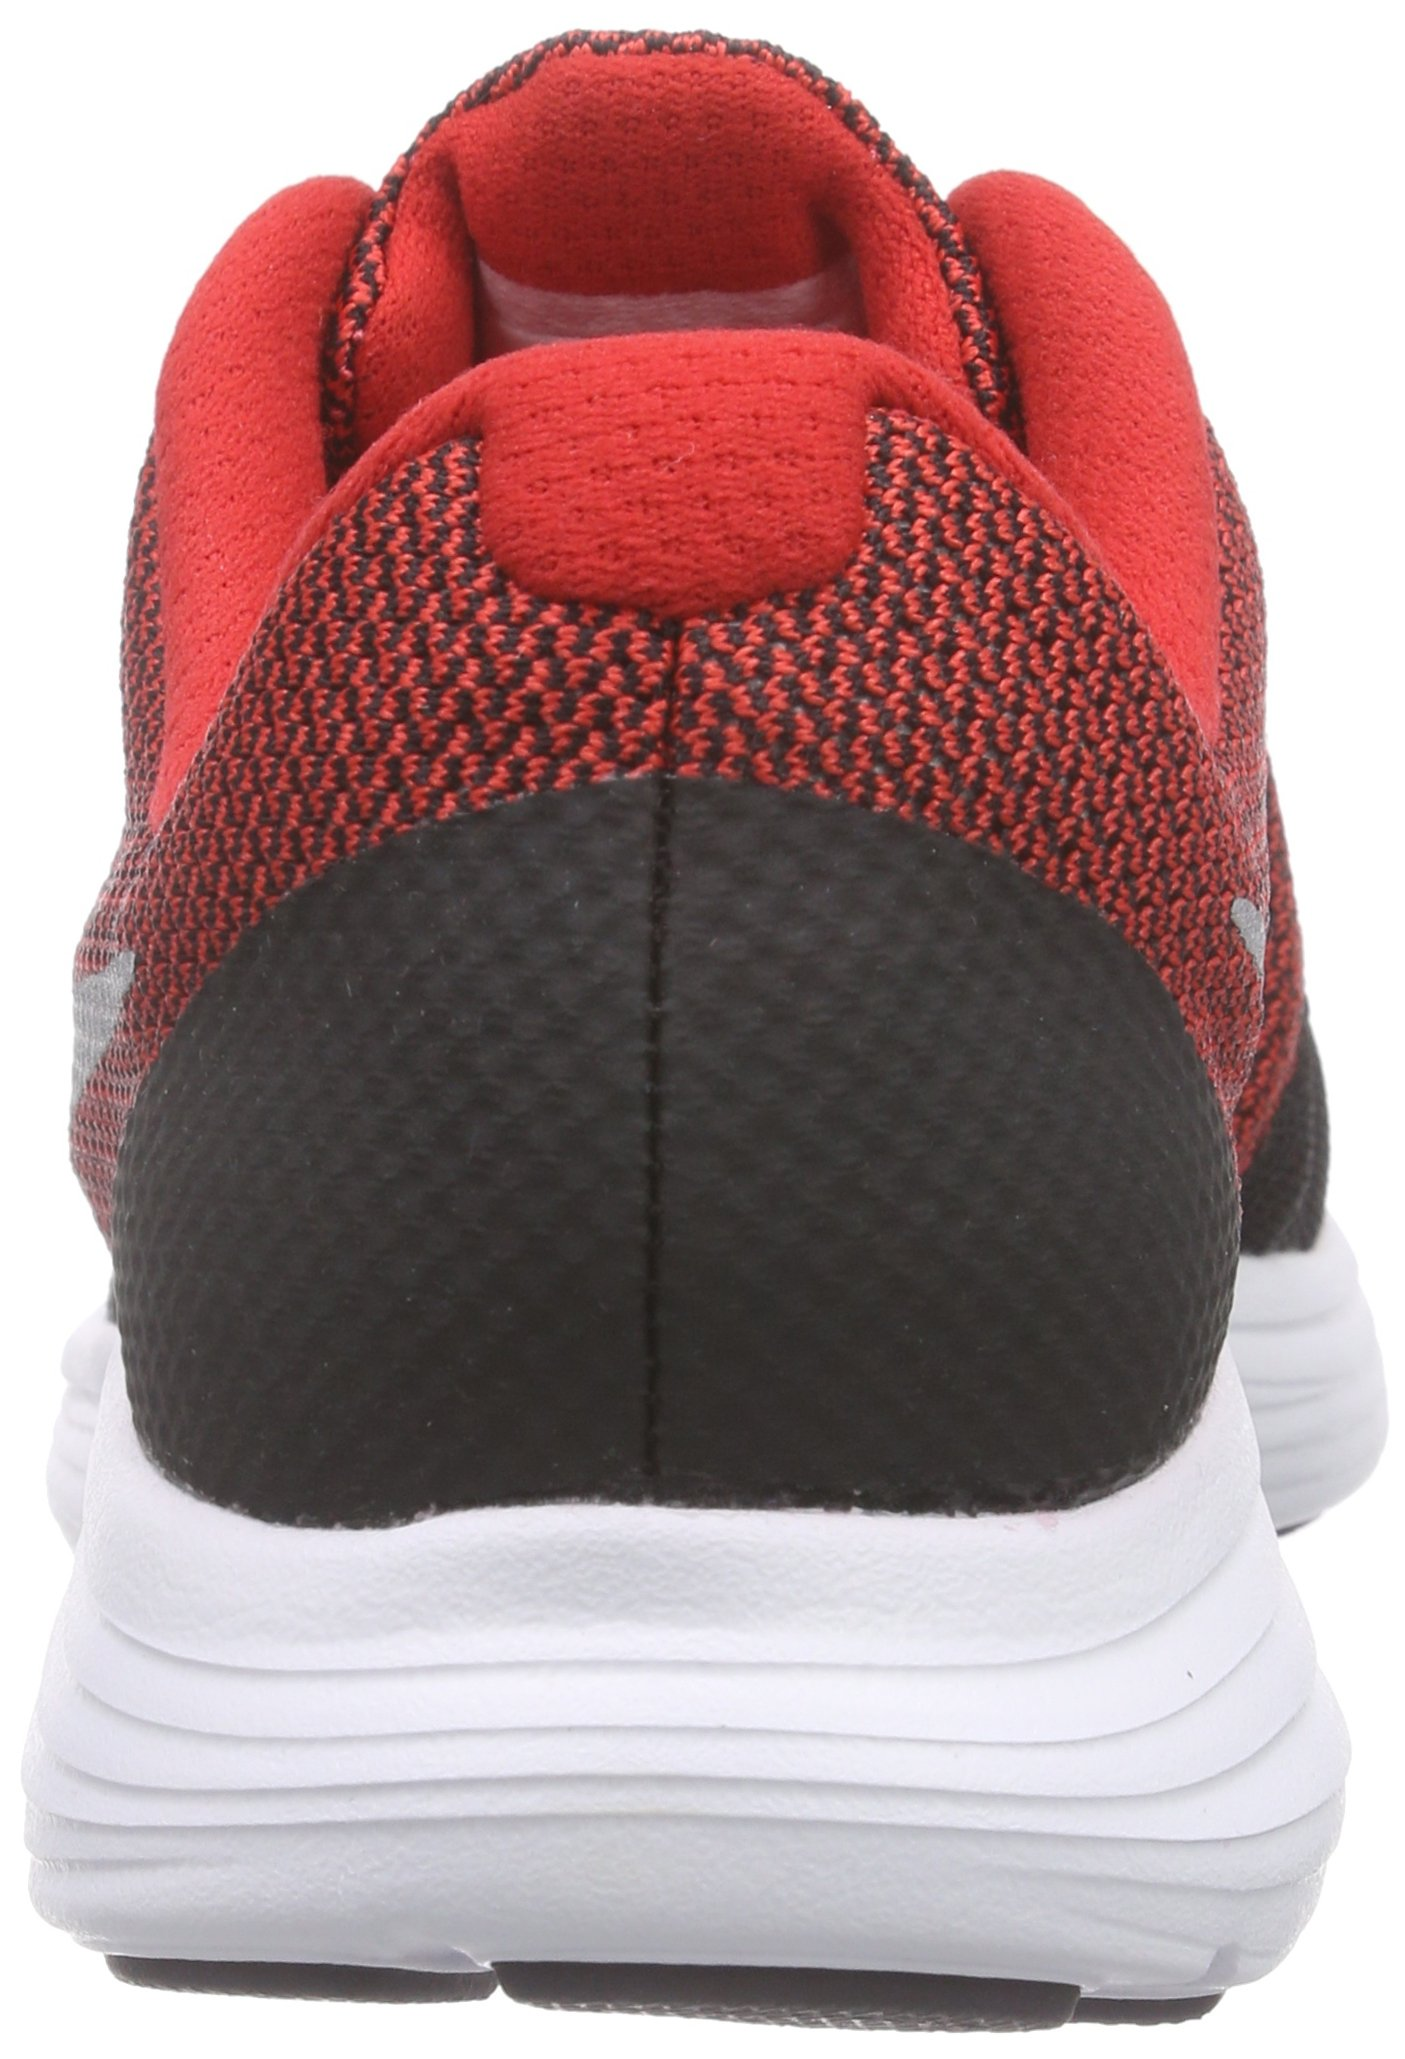 NIKE Boys' Revolution 3 Running Shoe (GS), University Red/Metallic Silver/Black, 3.5 M US Big Kid by Nike (Image #2)